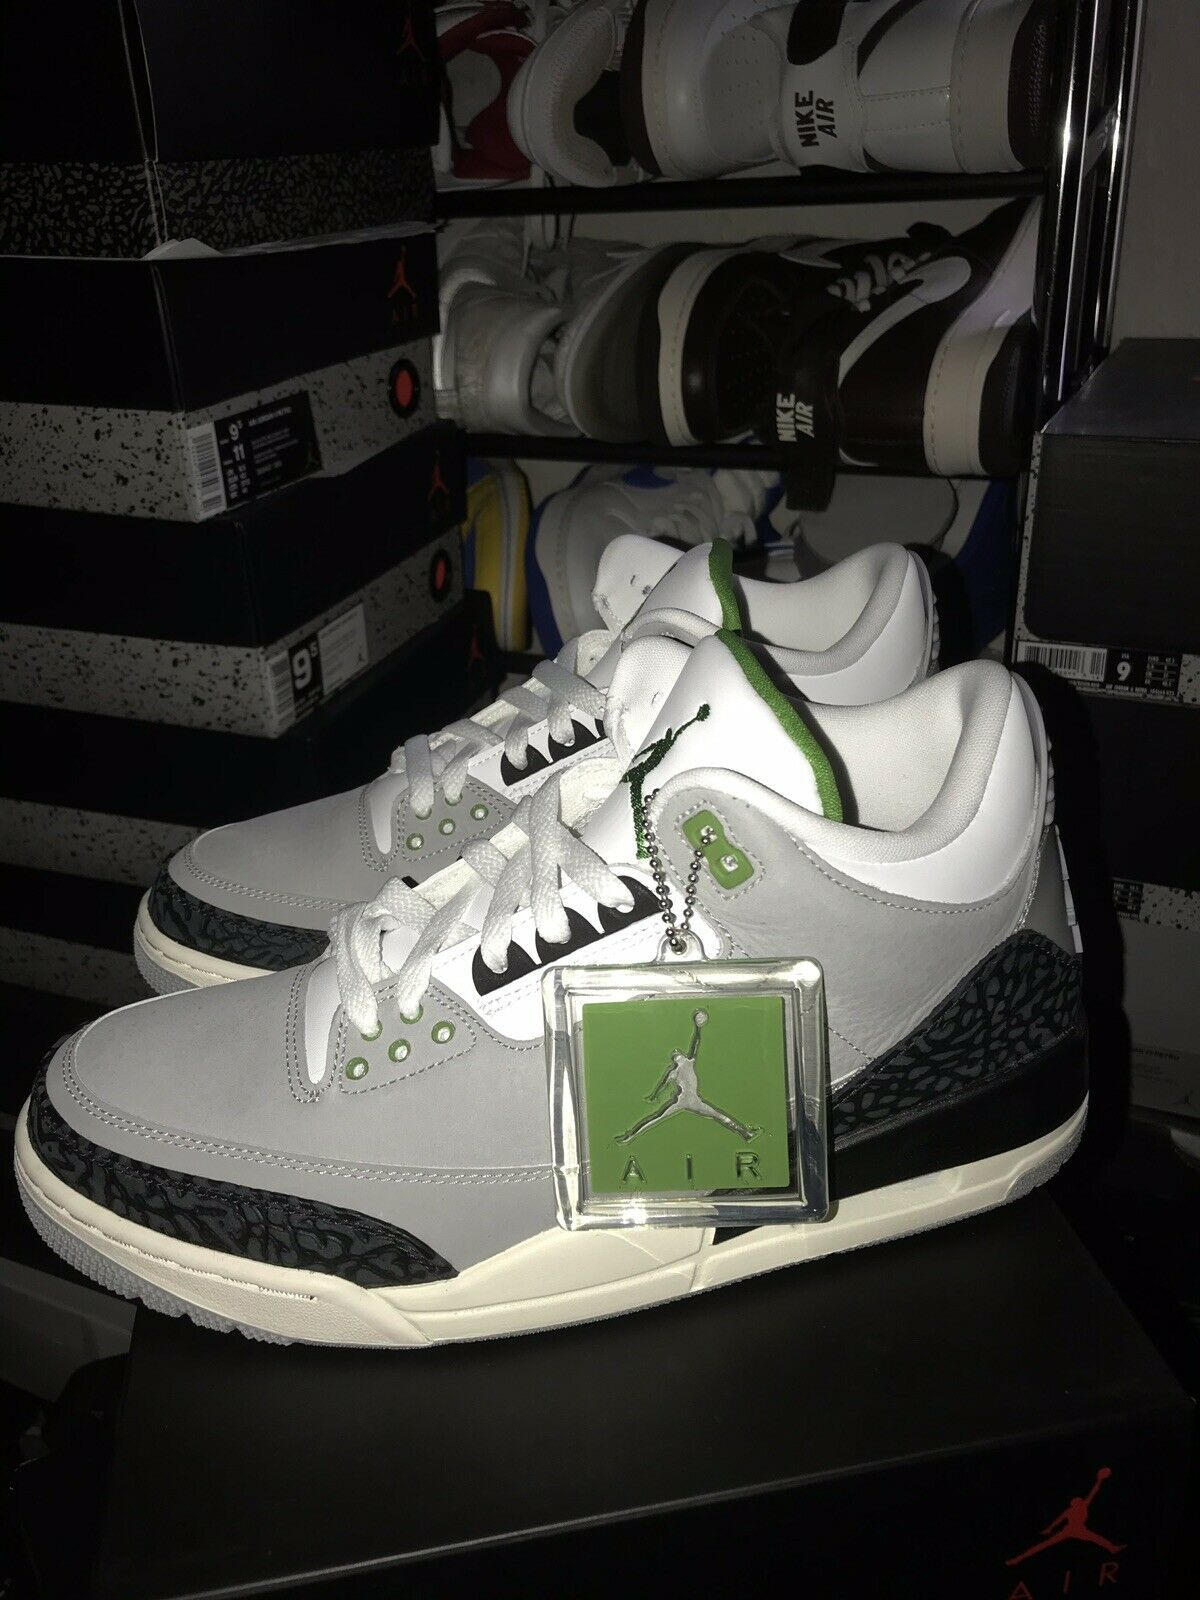 Nike Air Jordan 3 Retro Chlorophyll MJ